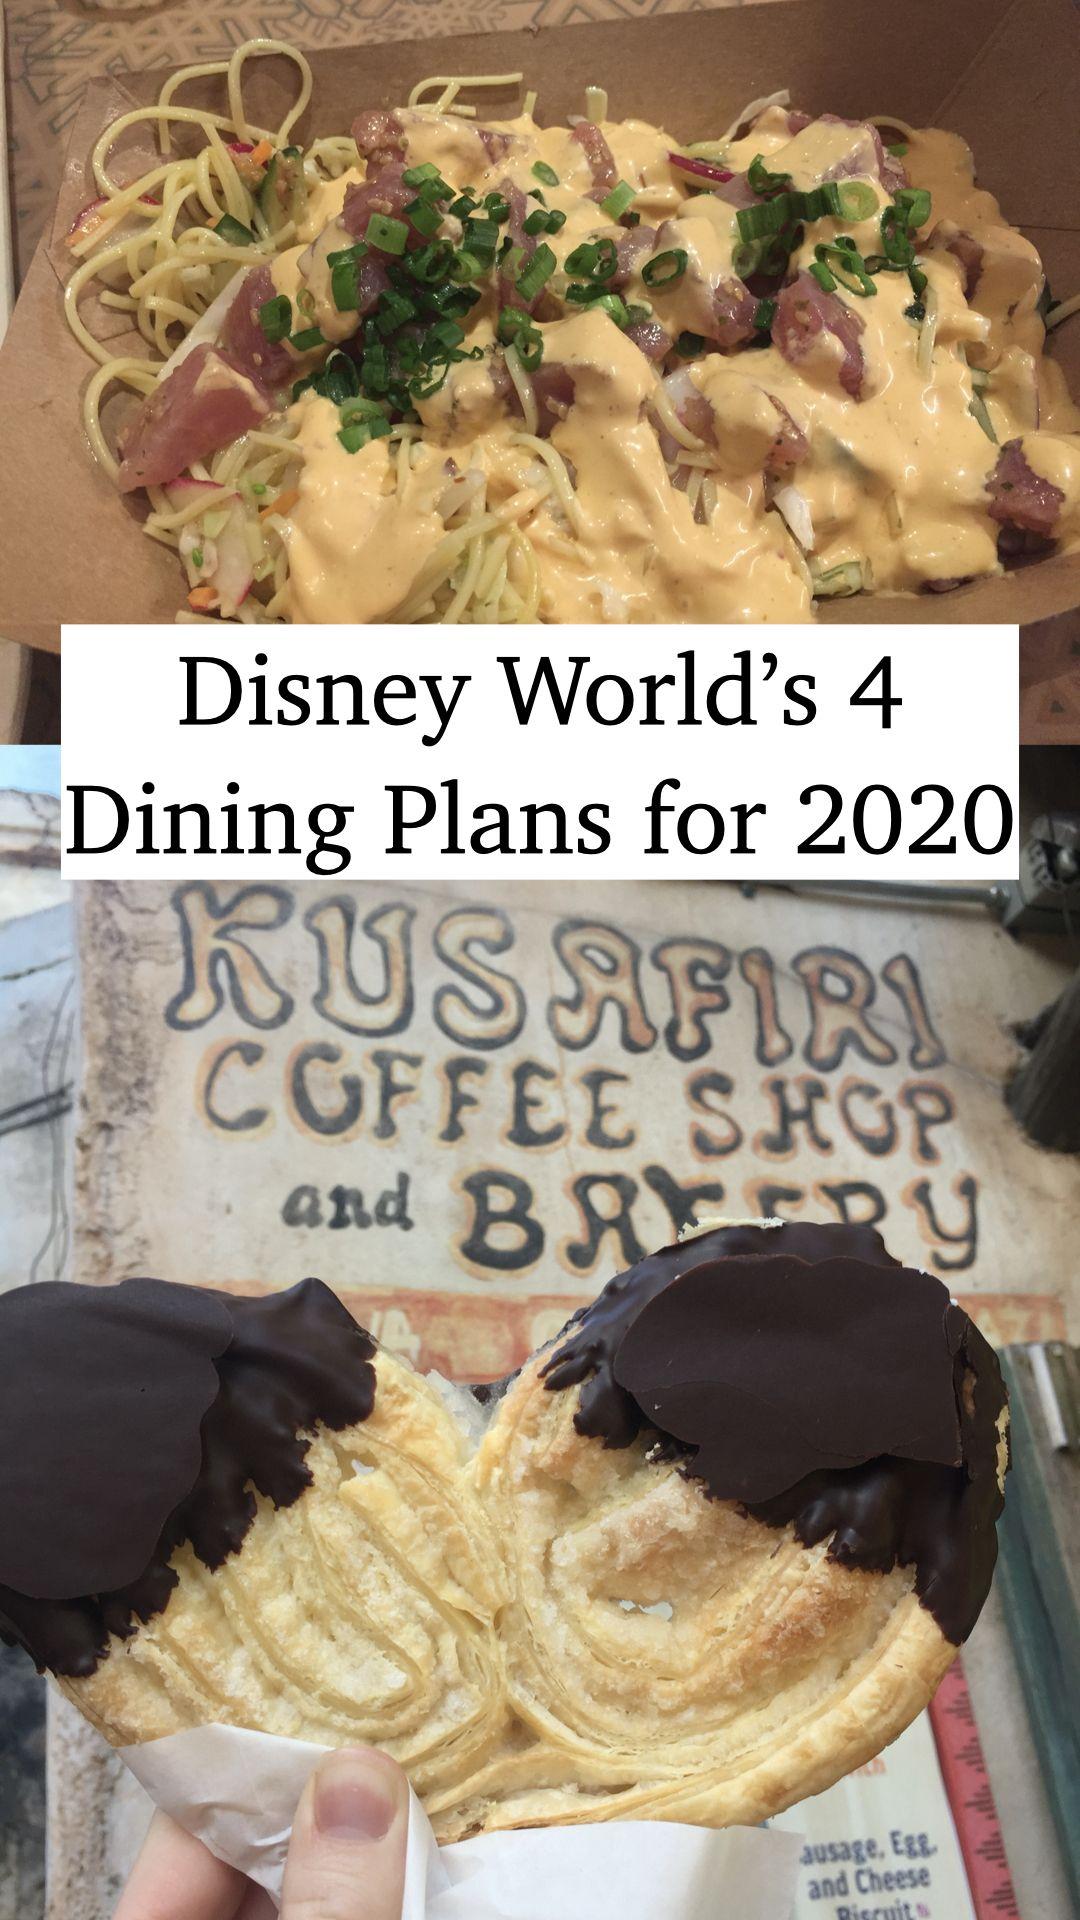 2020 Dining Plans in 2020 Disney dining plan, Disney